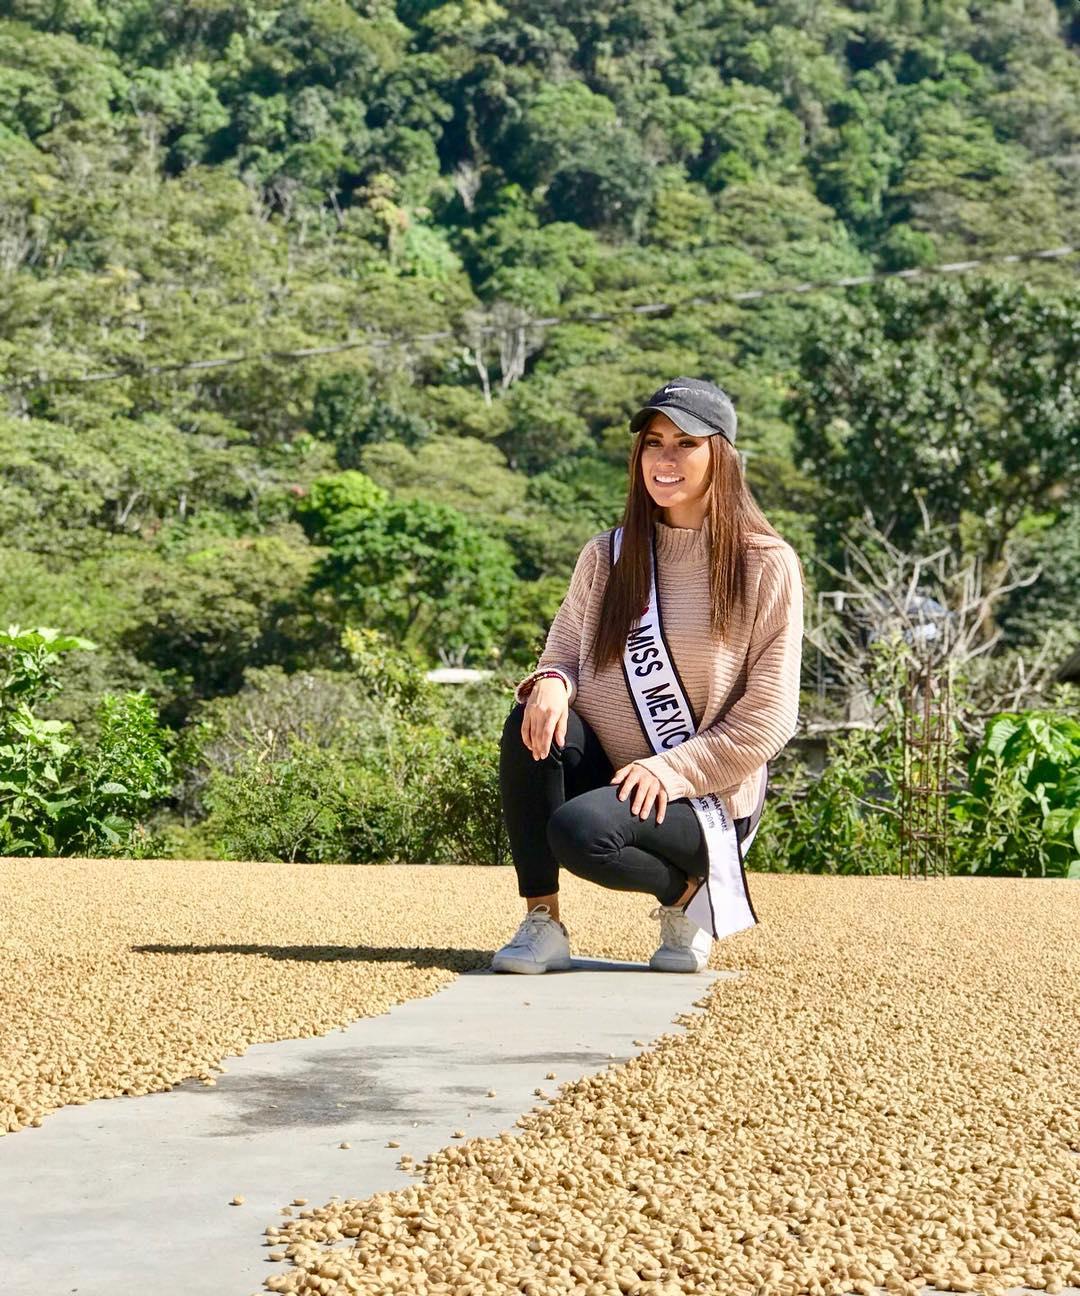 monica hernandez reynaga, mexico para reynado internacional cafe 2019. 46965410